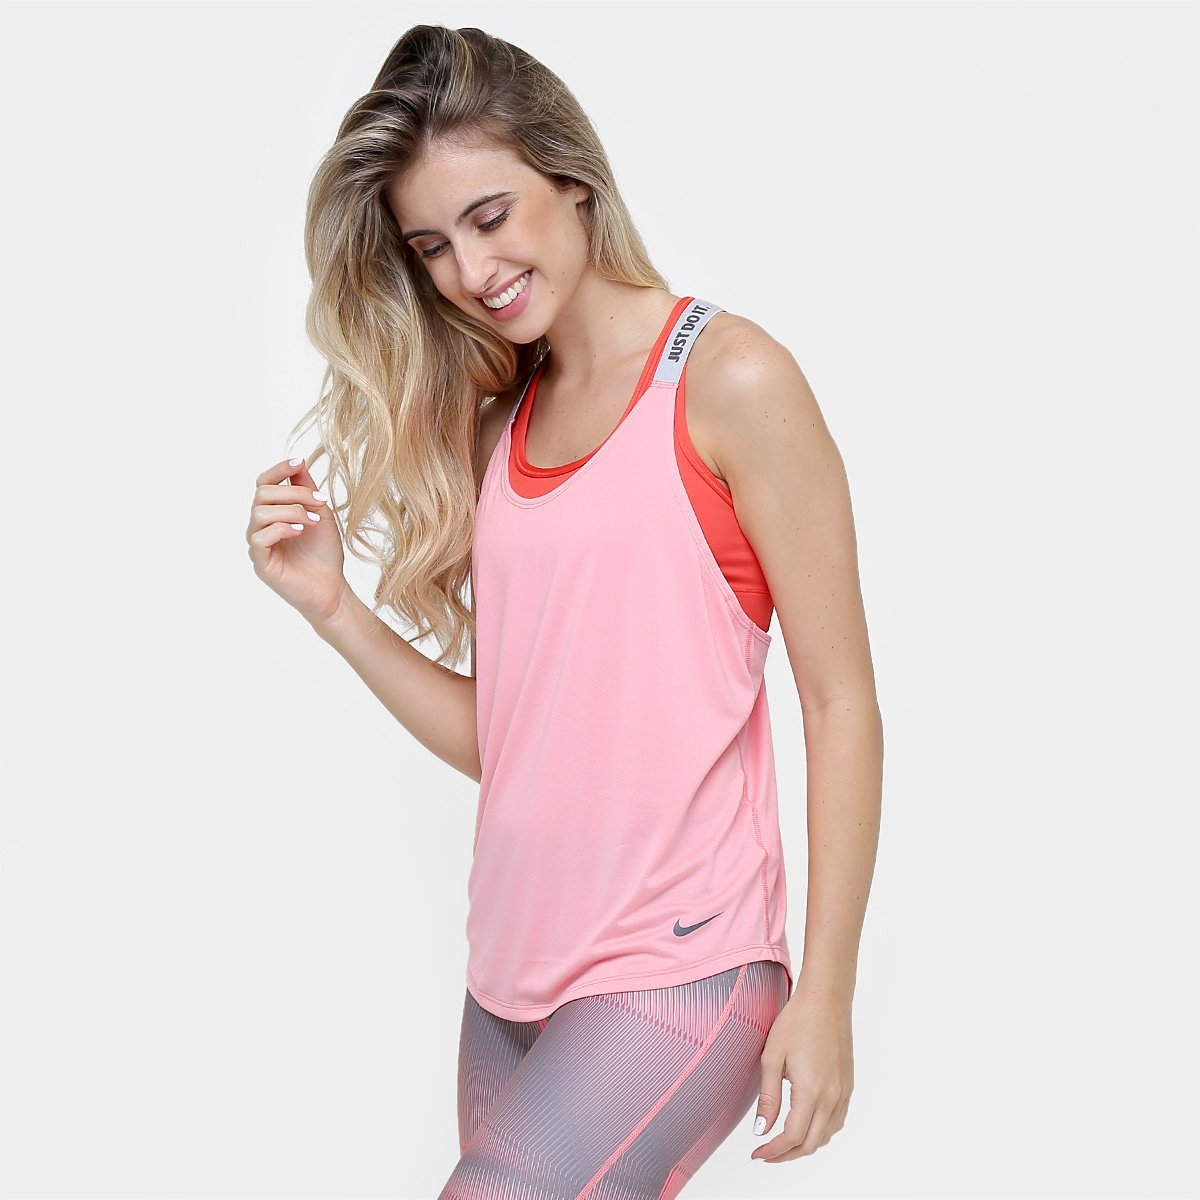 Camiseta Regata Nike Dry Elastika Feminina - Compre Agora  9d3c47539e2